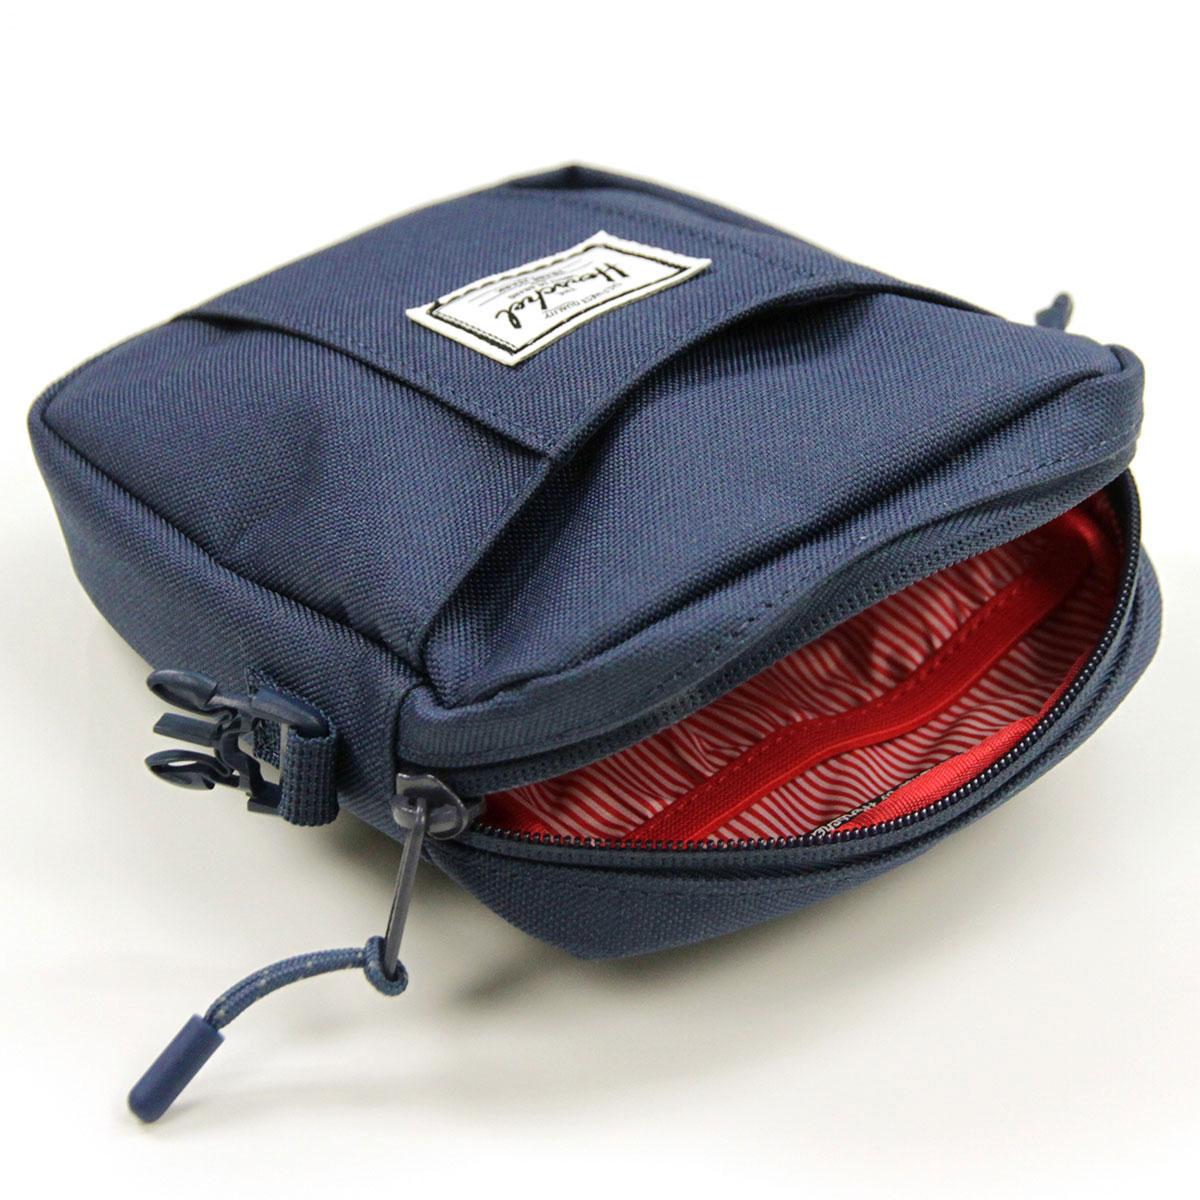 1ab99f8b27 ... Hershel supply Herschel Supply regular store bag shoulder bag CRUZ POUCH  CLASSICS | HIP SACKS 10388 ...